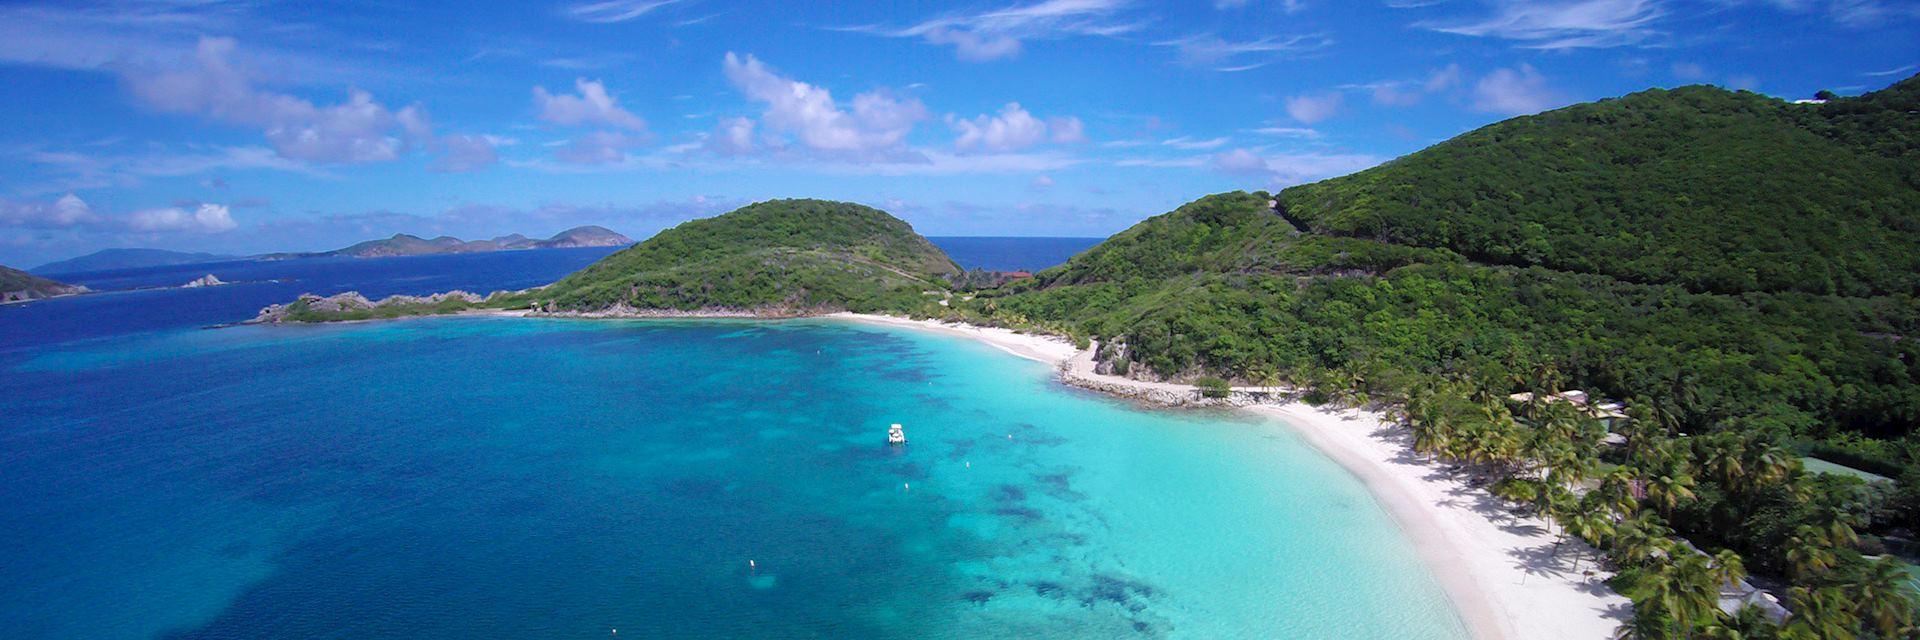 Dead Man's Bay, Peter Island in the British Virgin Islands